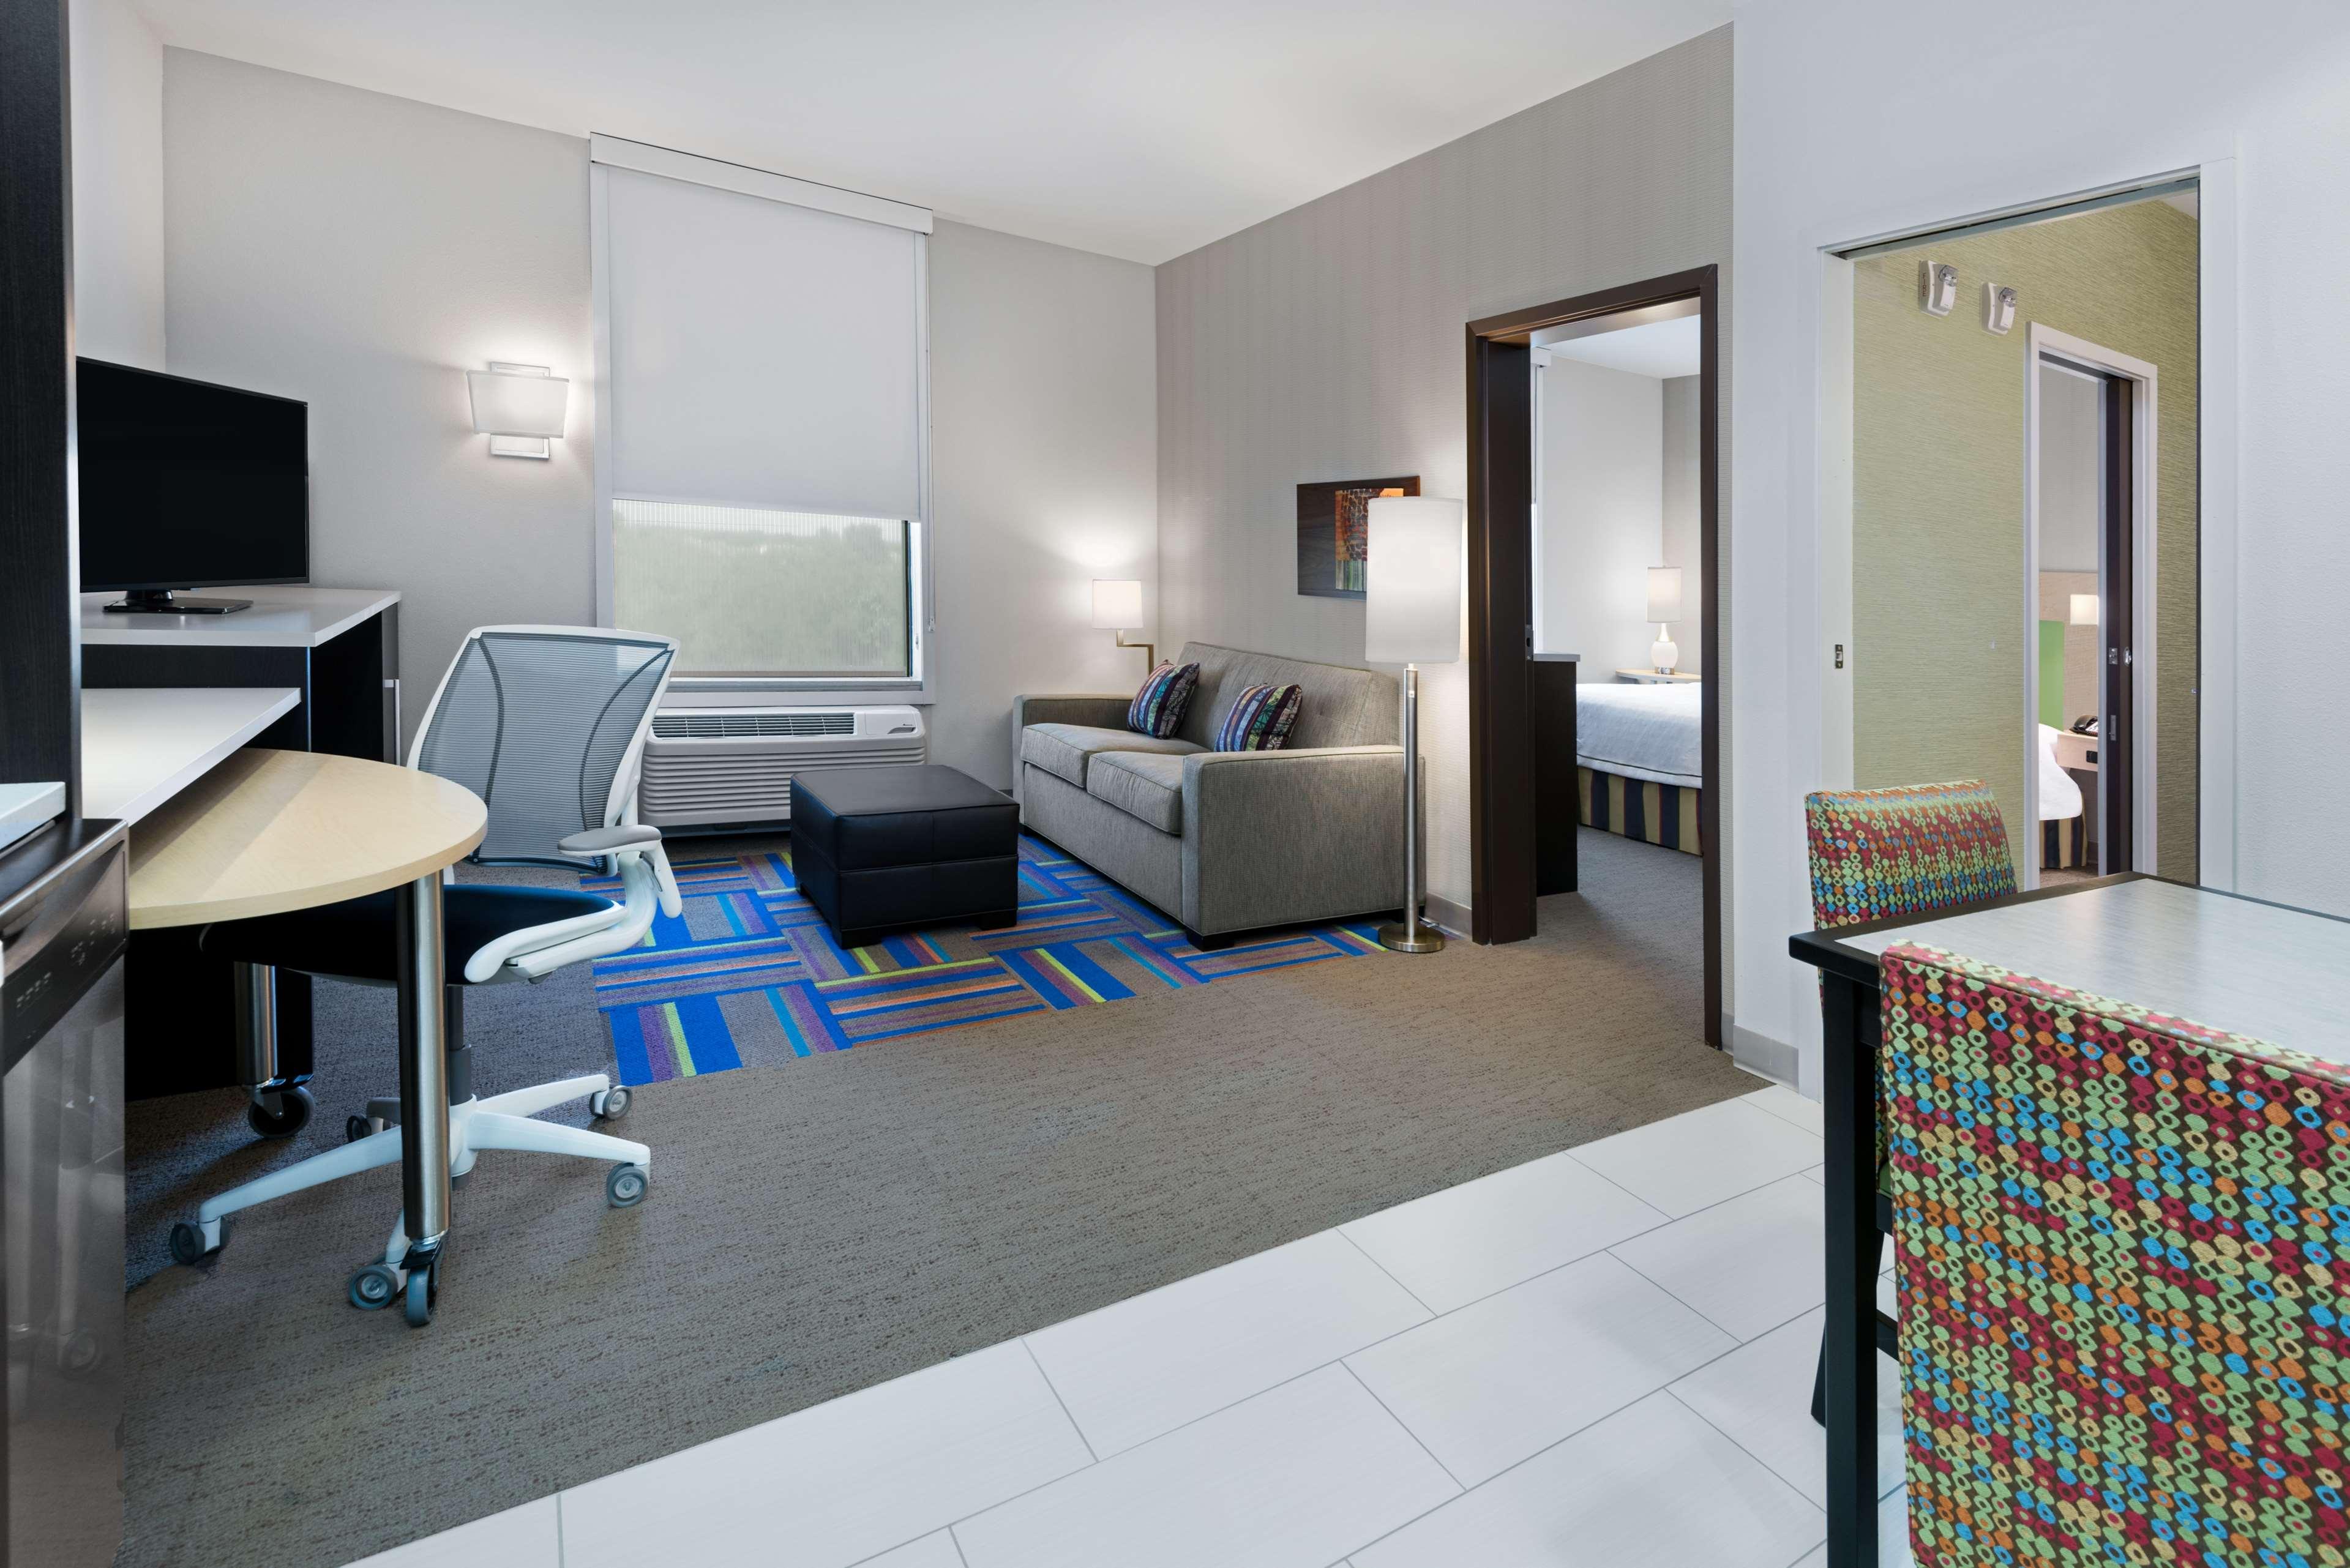 Home2 Suites by Hilton Austin Airport image 19